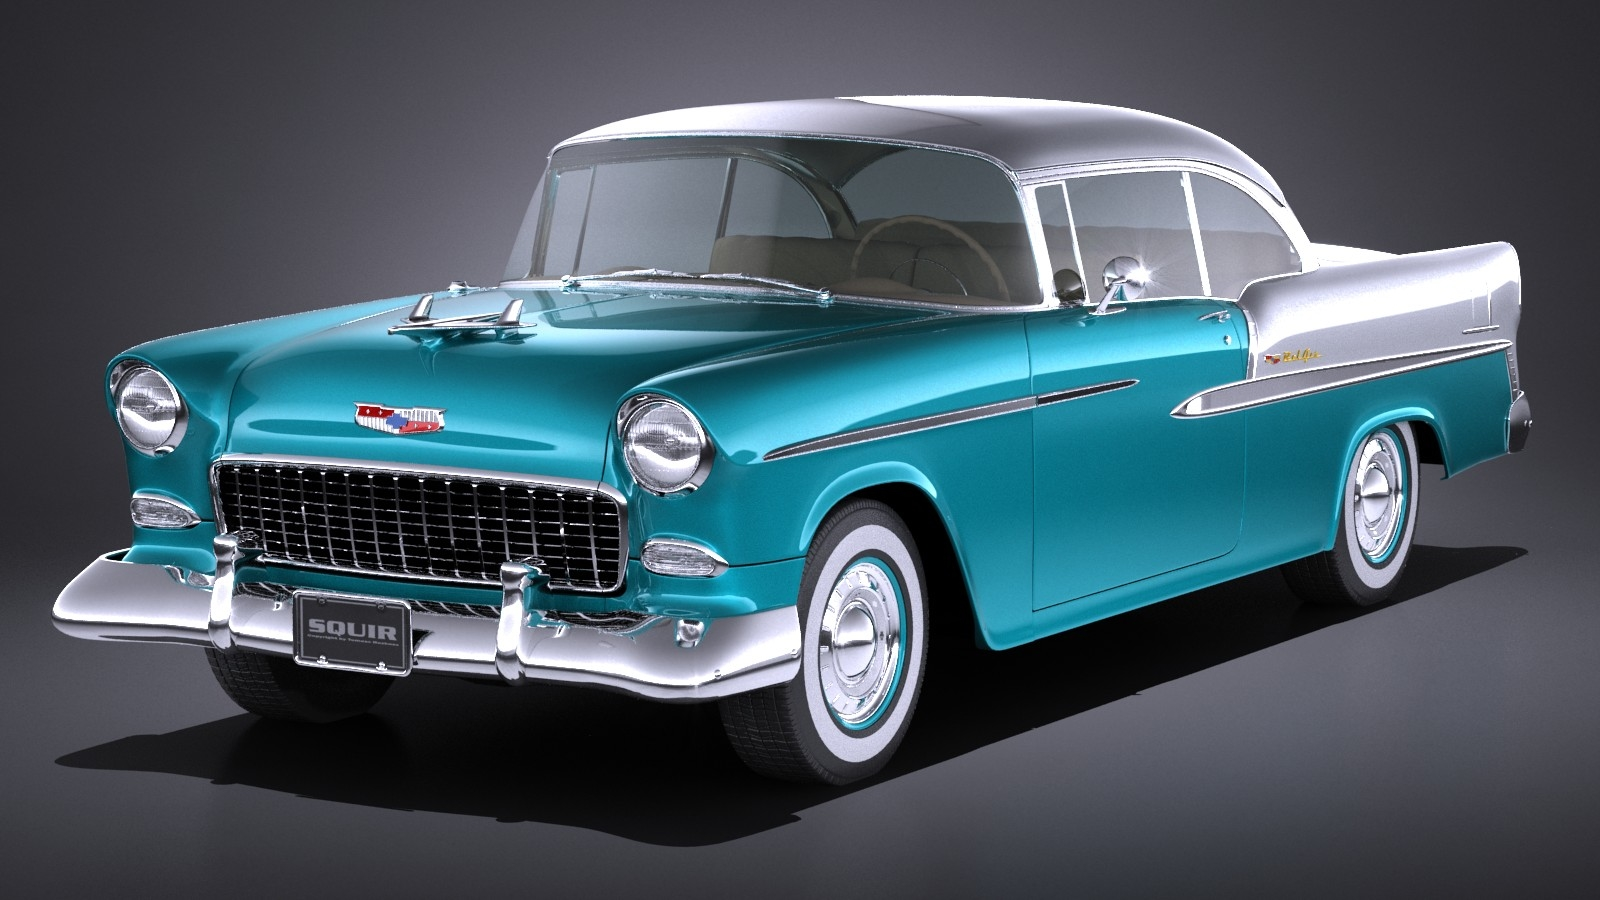 Chevrolet Bel Air >> Chevrolet Bel Air 1955 Coupe